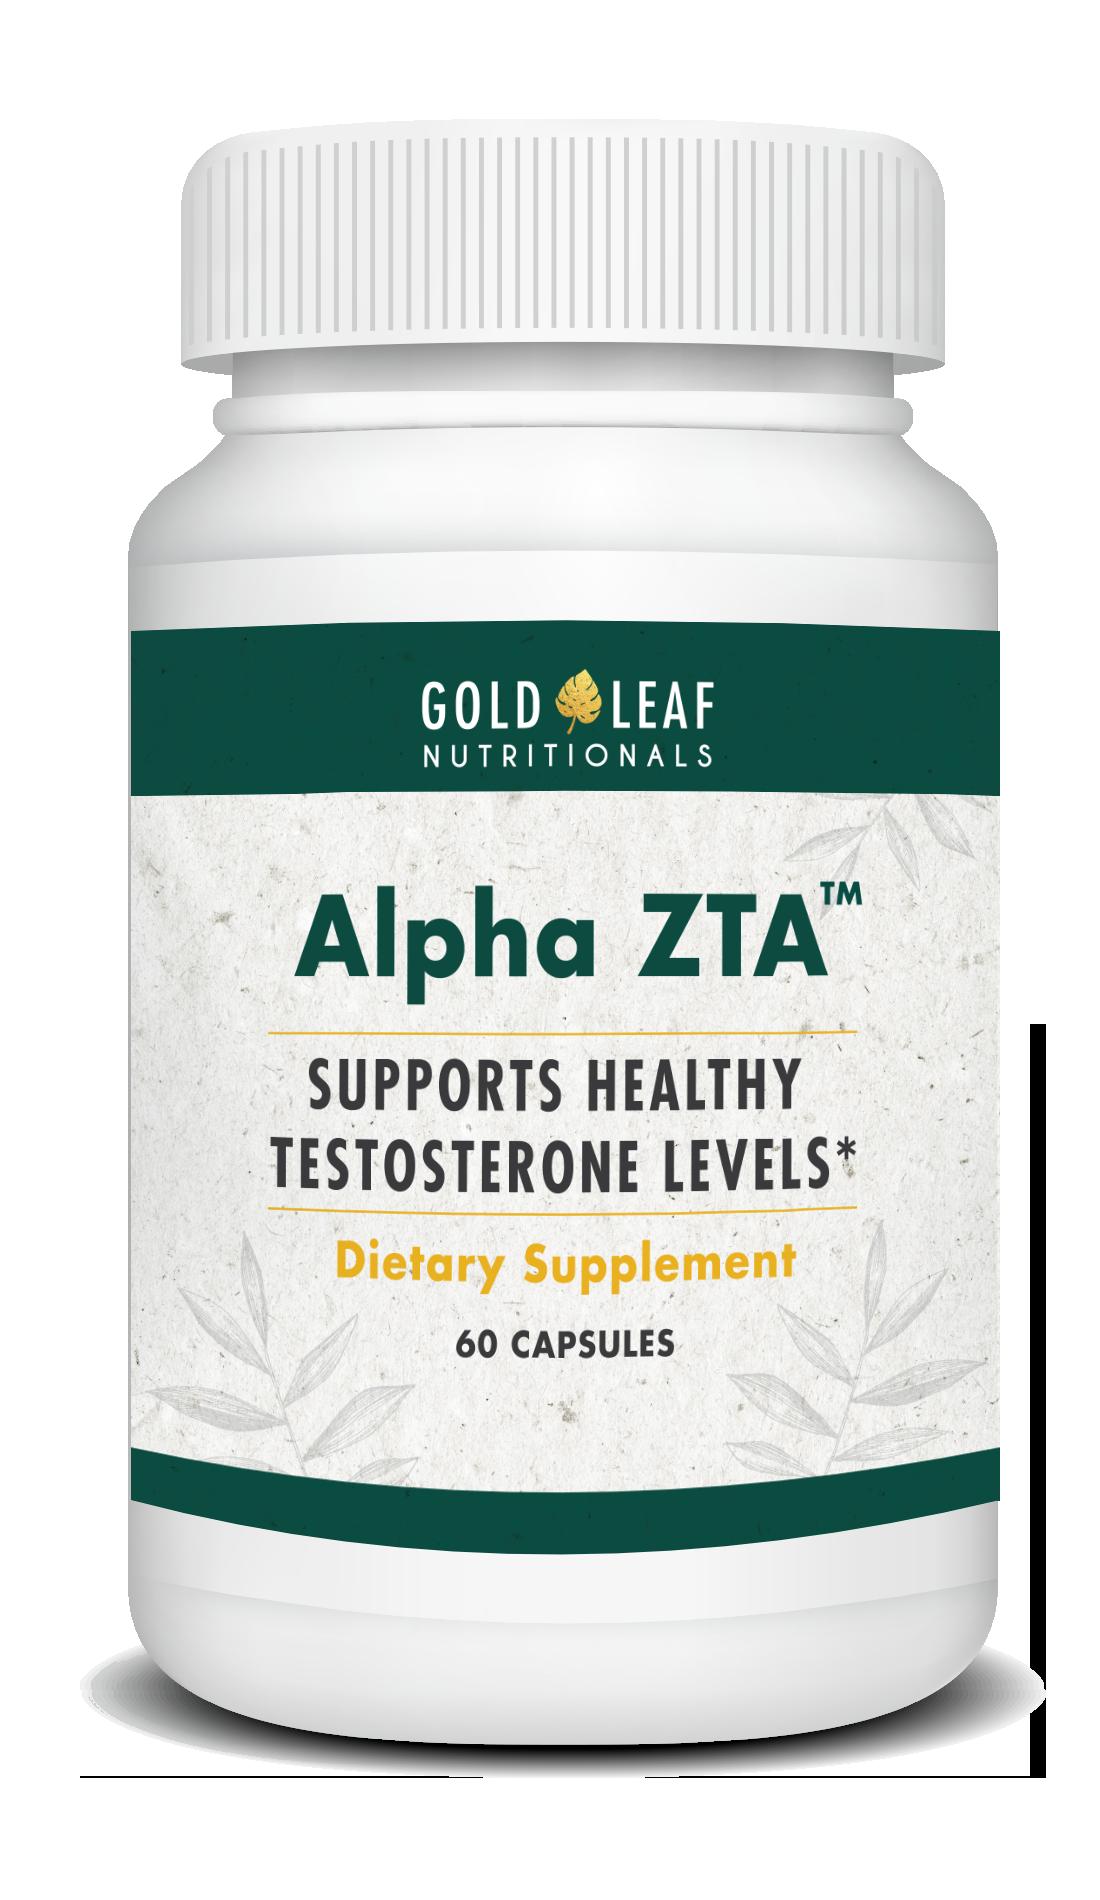 Bottle of AlphaZTA